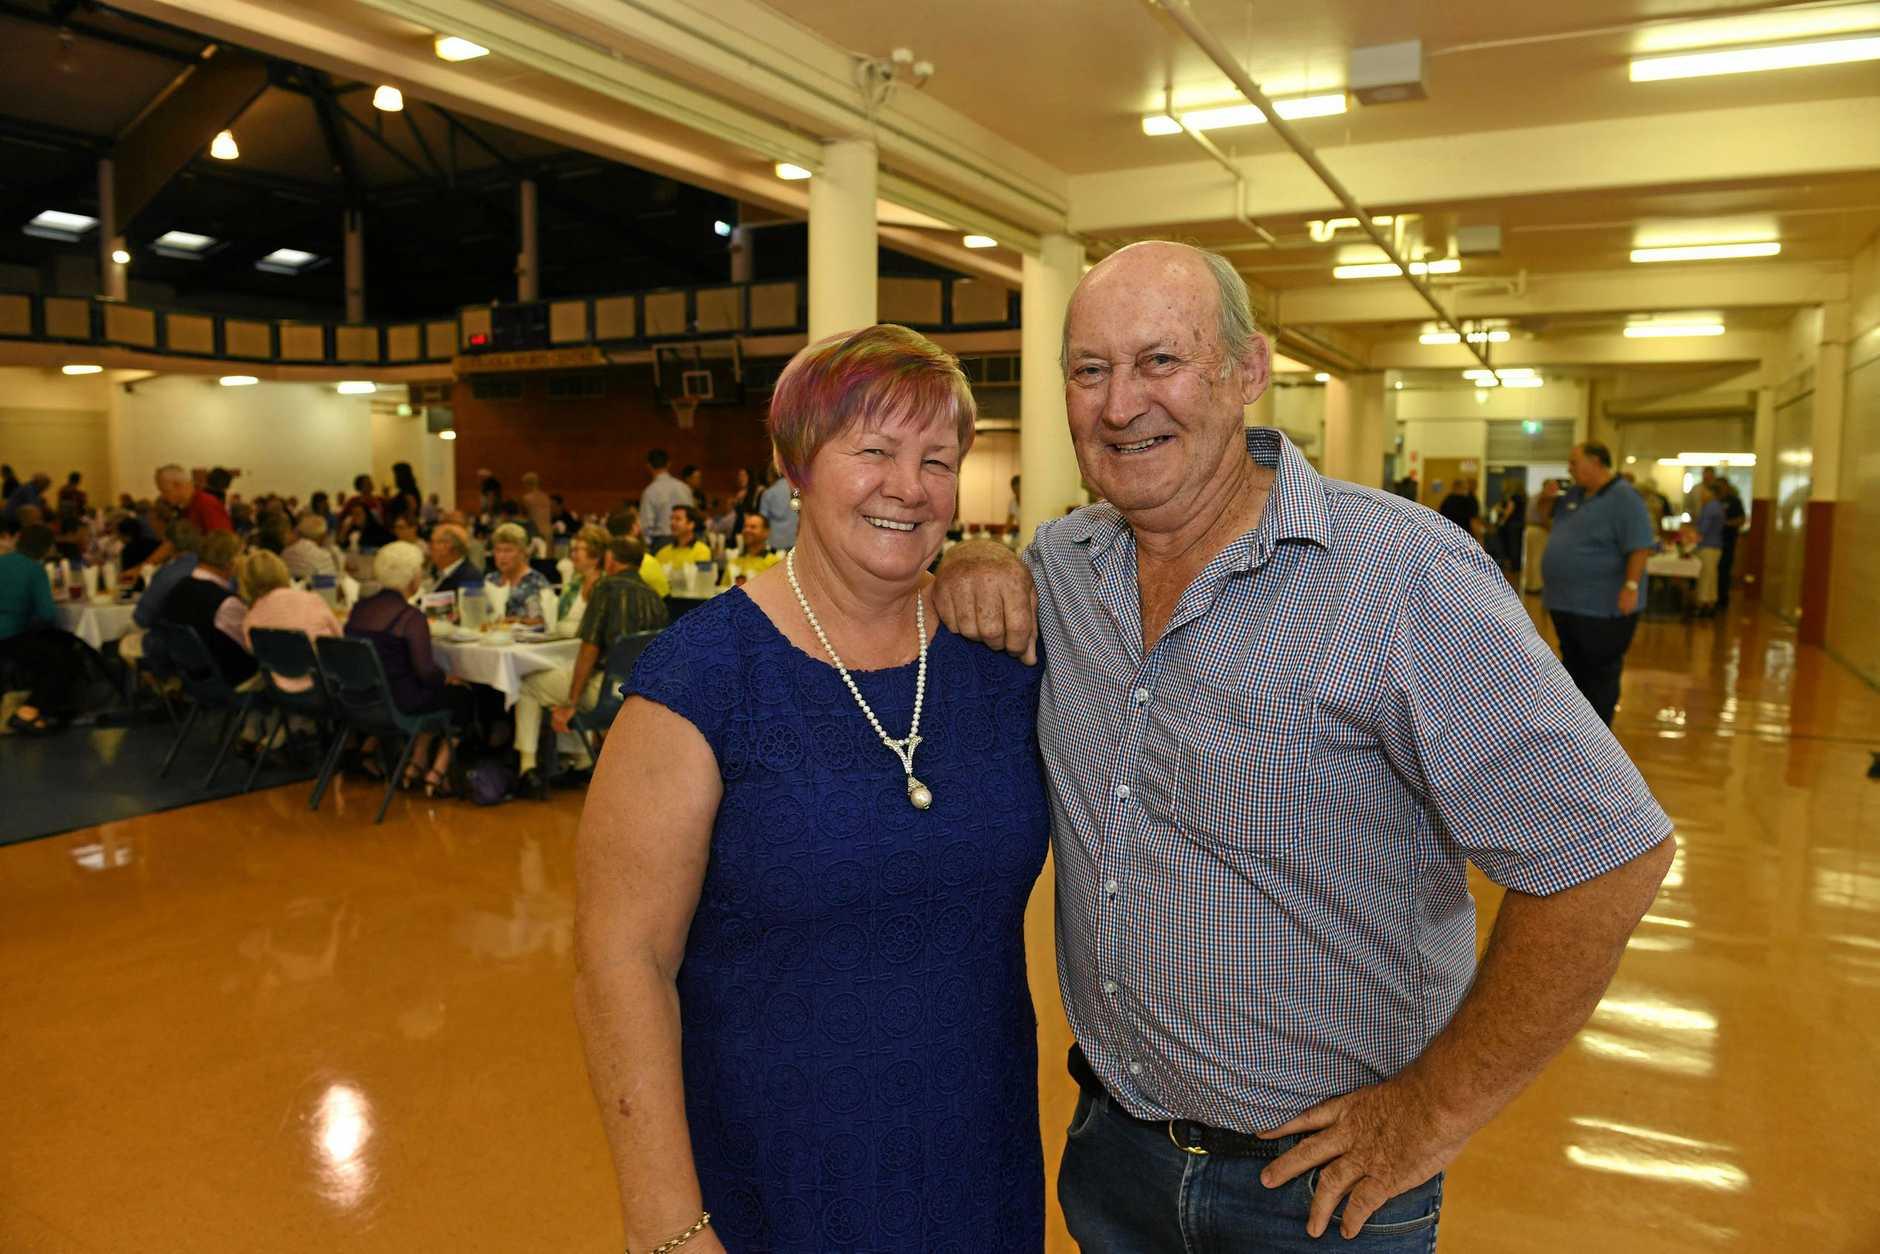 Marlene Owen and Tony Stewart. Tony Stewart is busy helping Queensland farmers doing it tough in western Queensland.